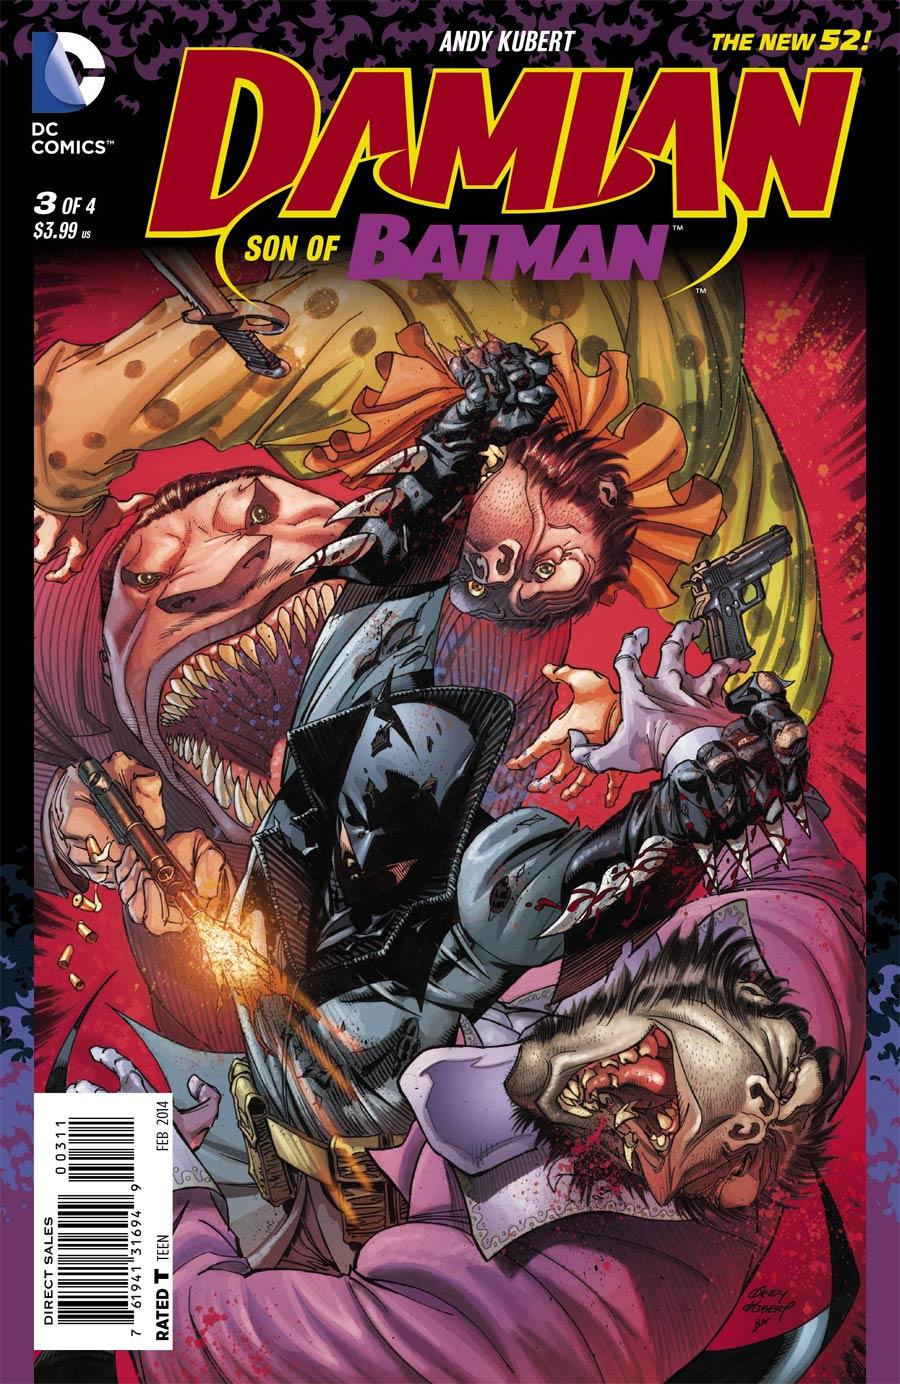 Damian Son Of Batman #3 Cover A Regular Andy Kubert Cover